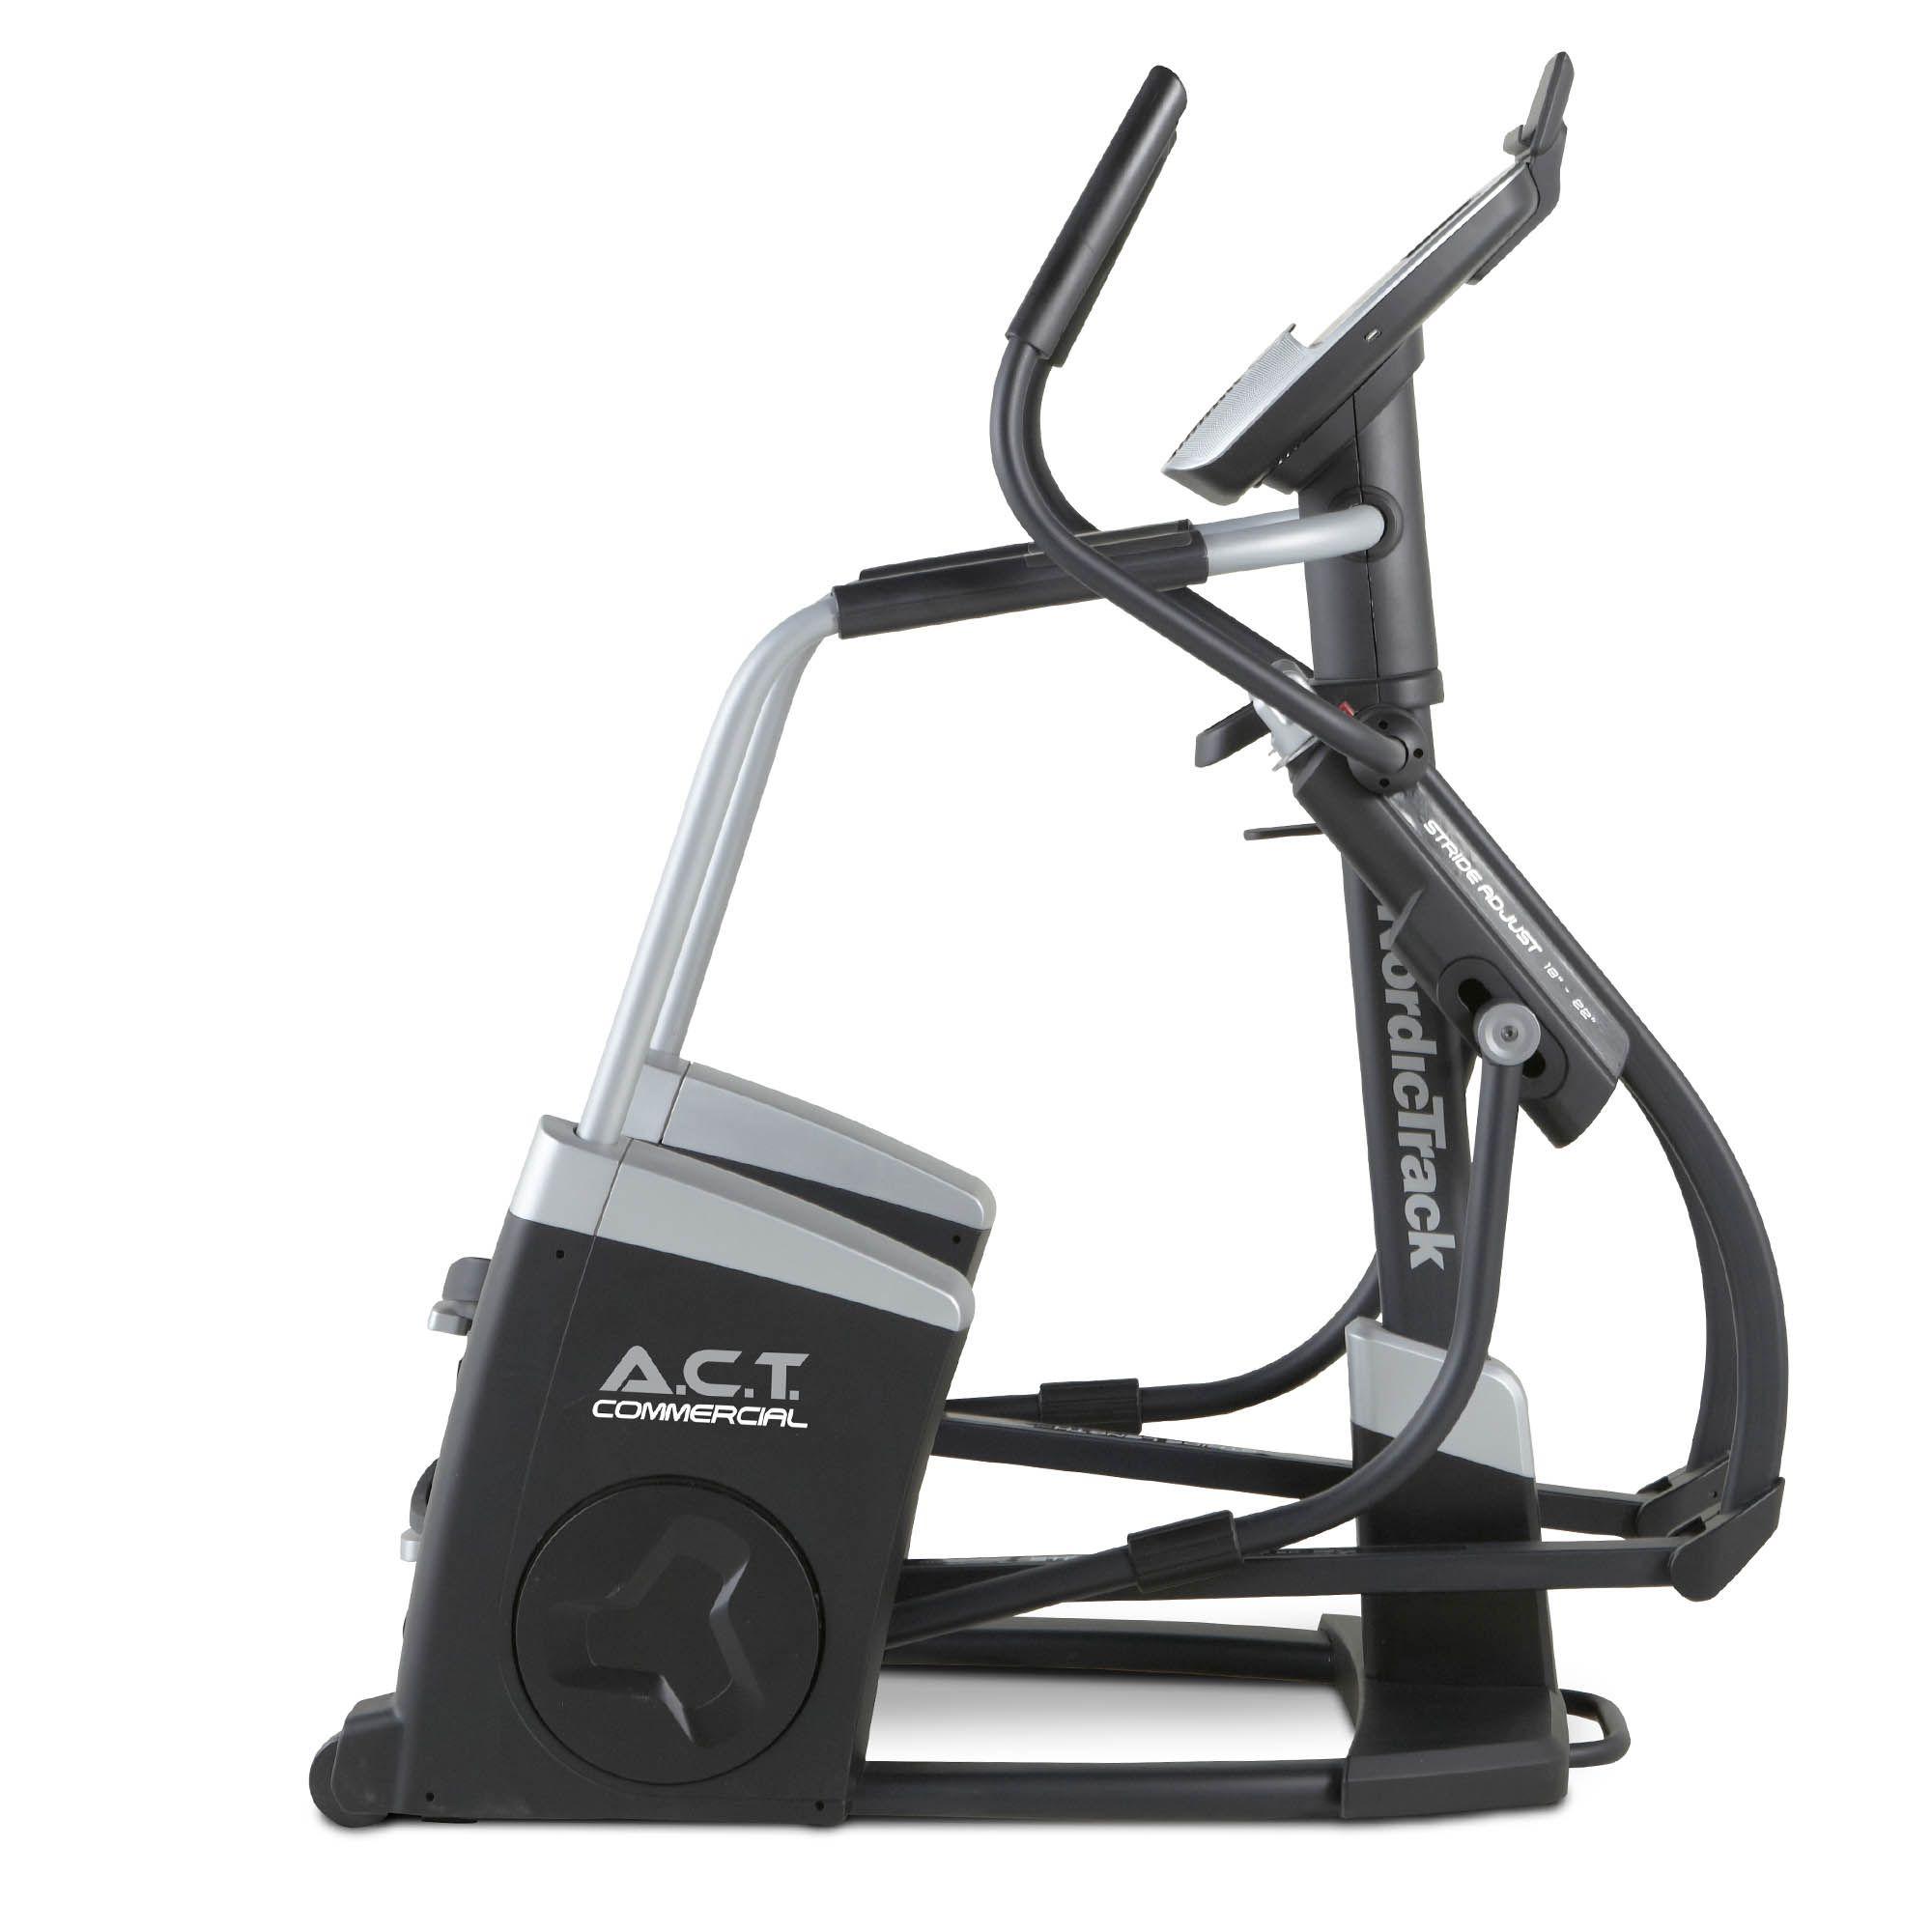 NordicTrack A.C.T. Commercial Elliptical Cross Trainer